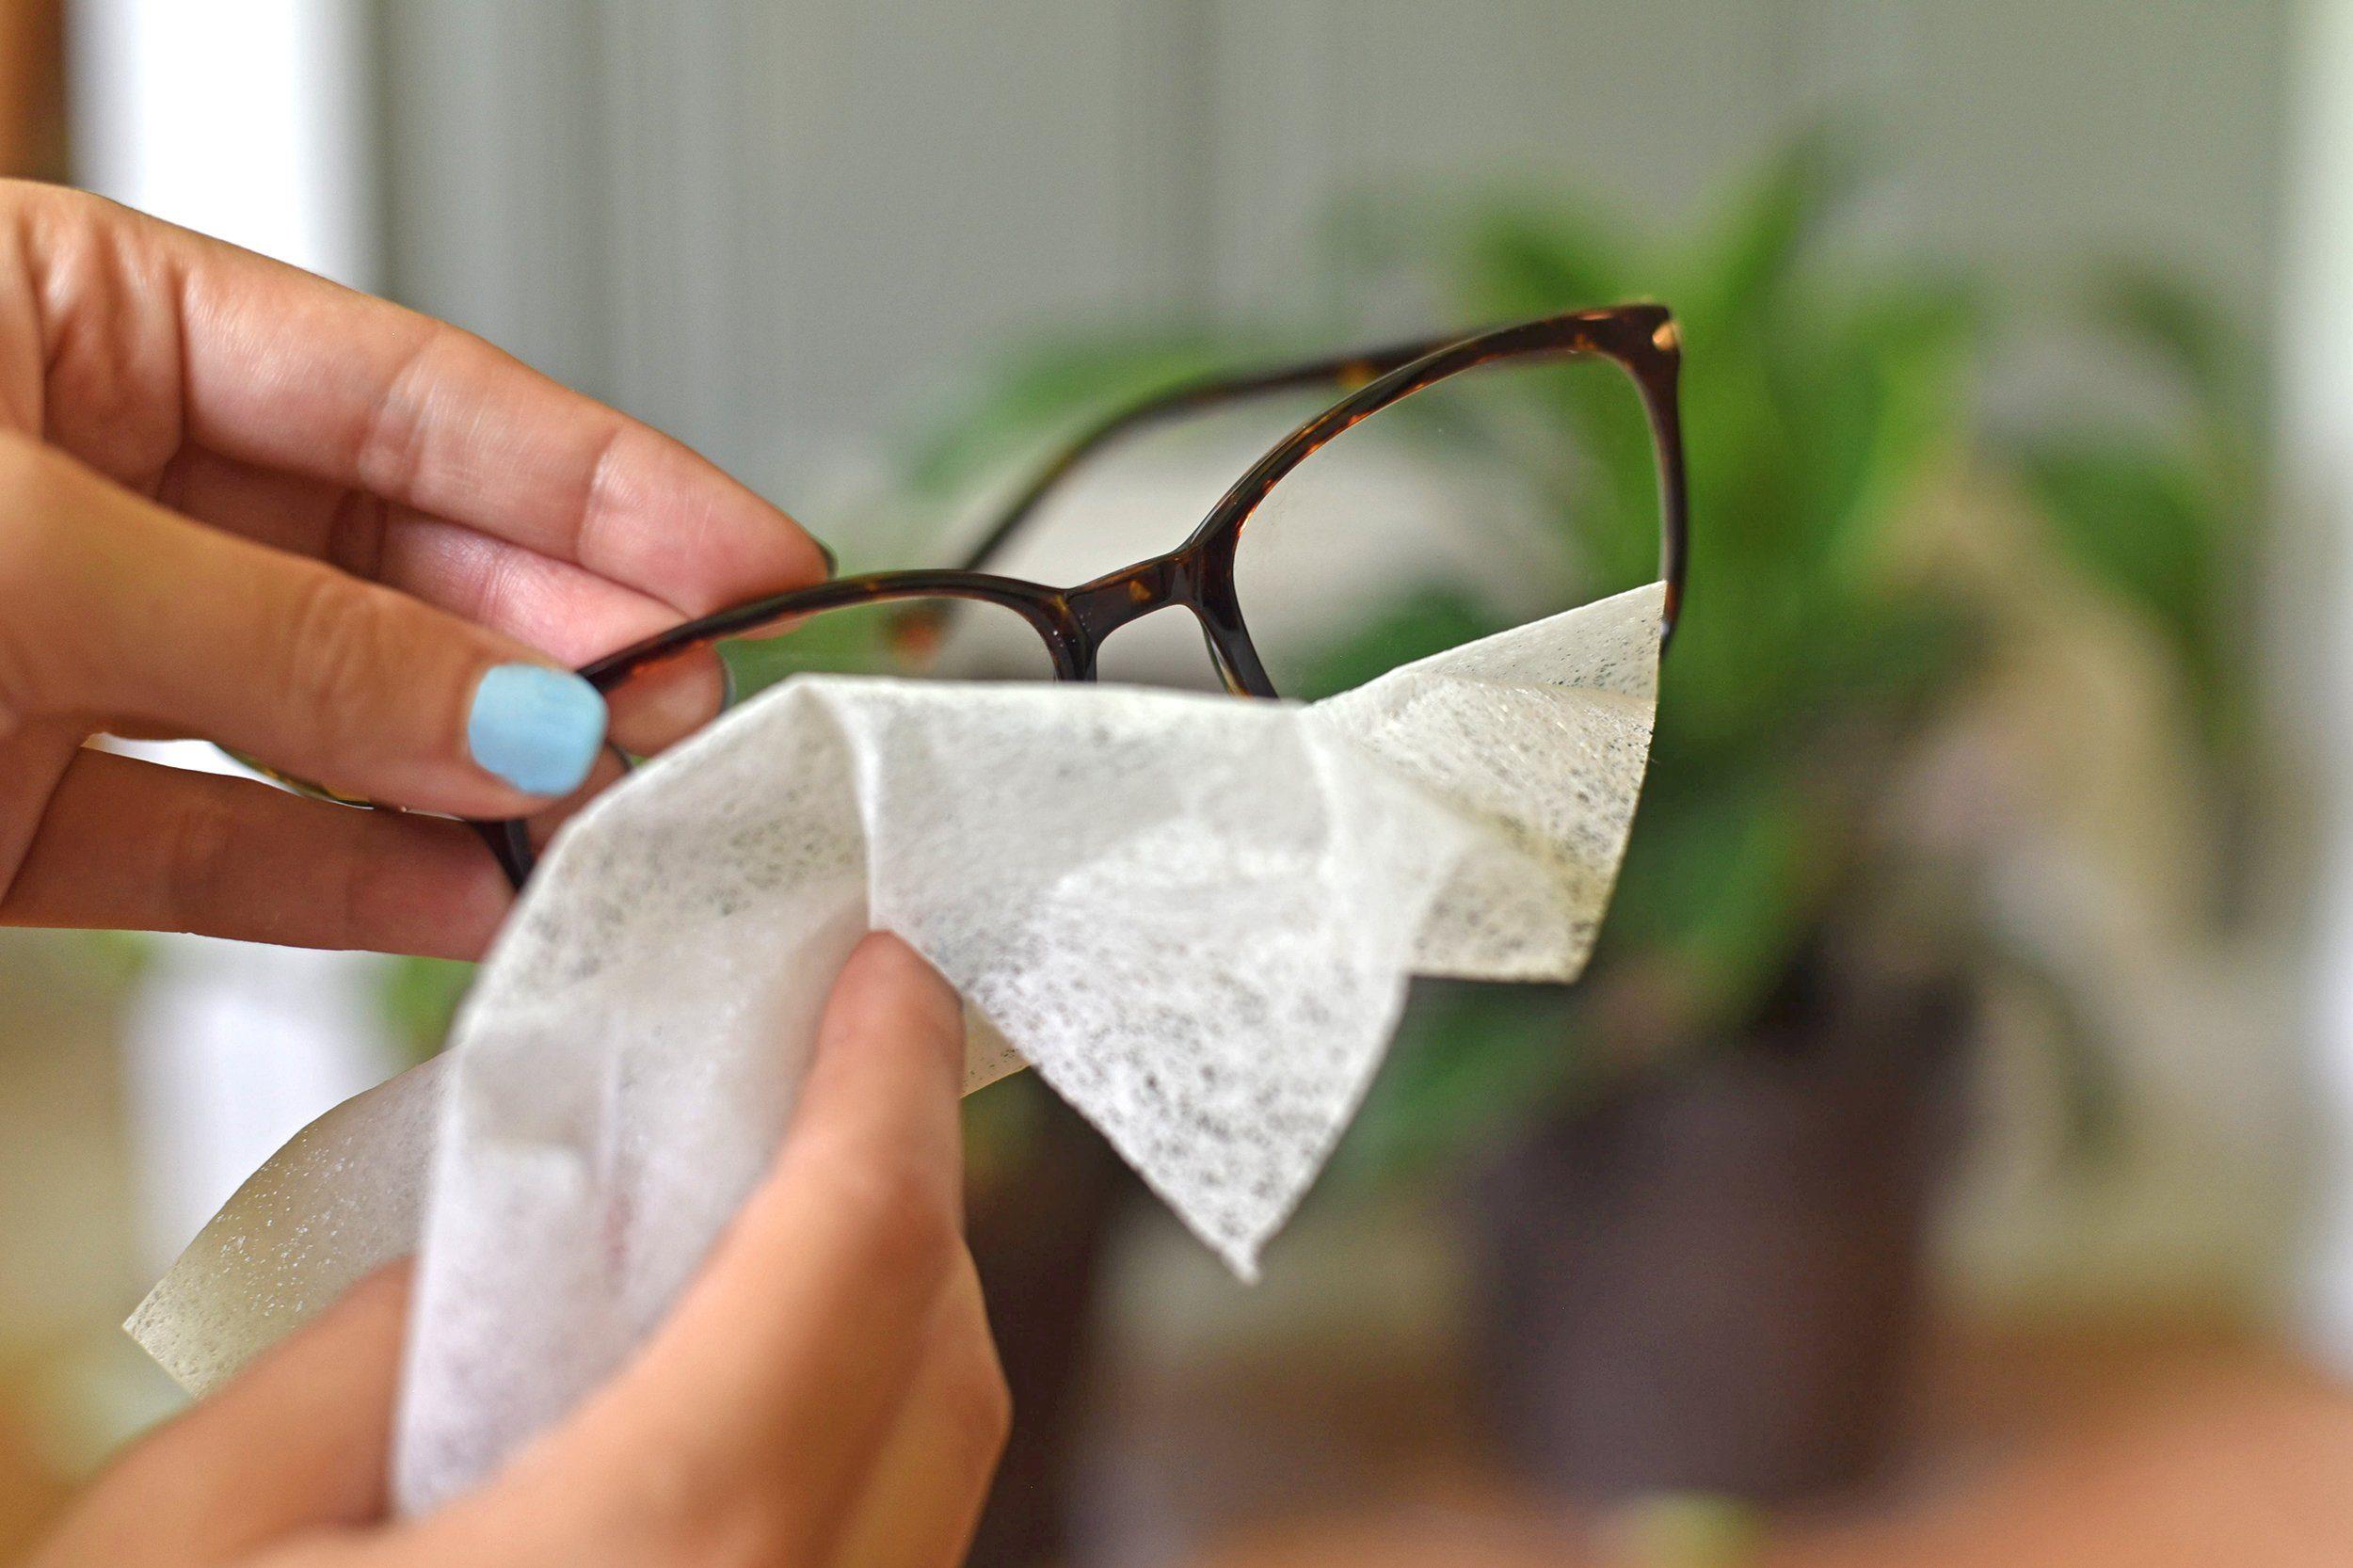 eyeglasses dryer sheets